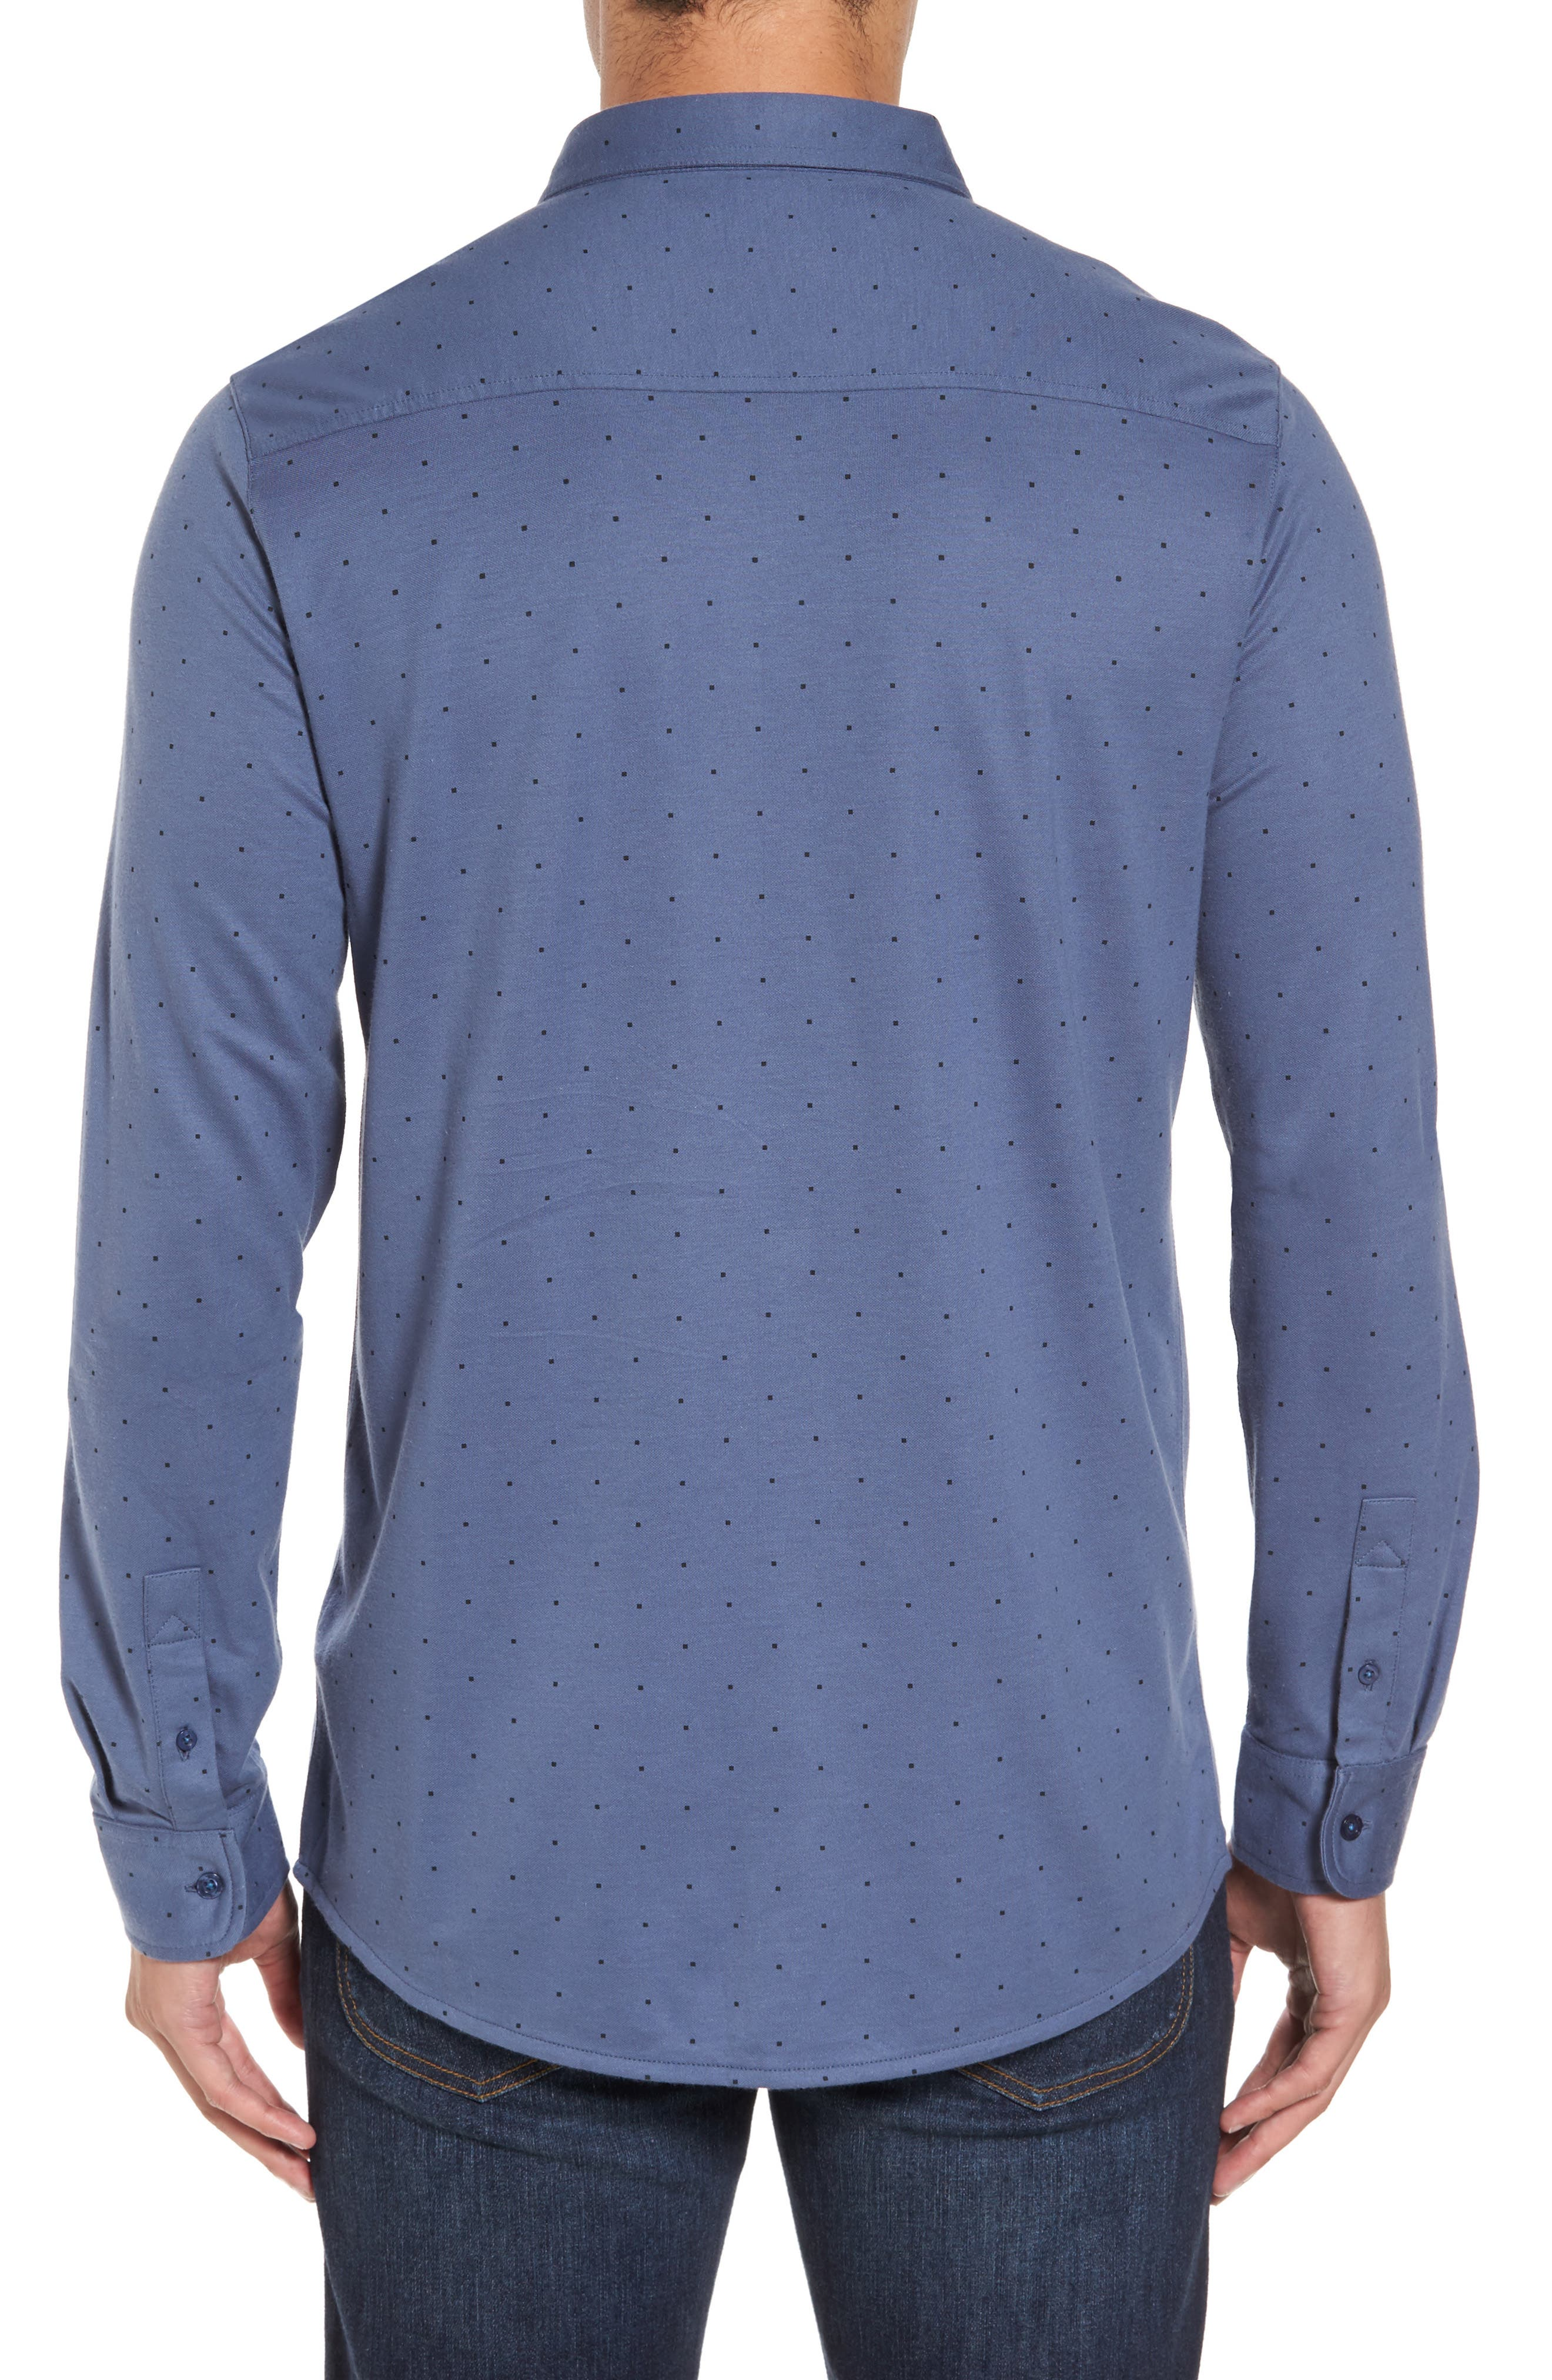 Randy Square Dot Sport Shirt,                             Alternate thumbnail 2, color,                             Vintage Indigo